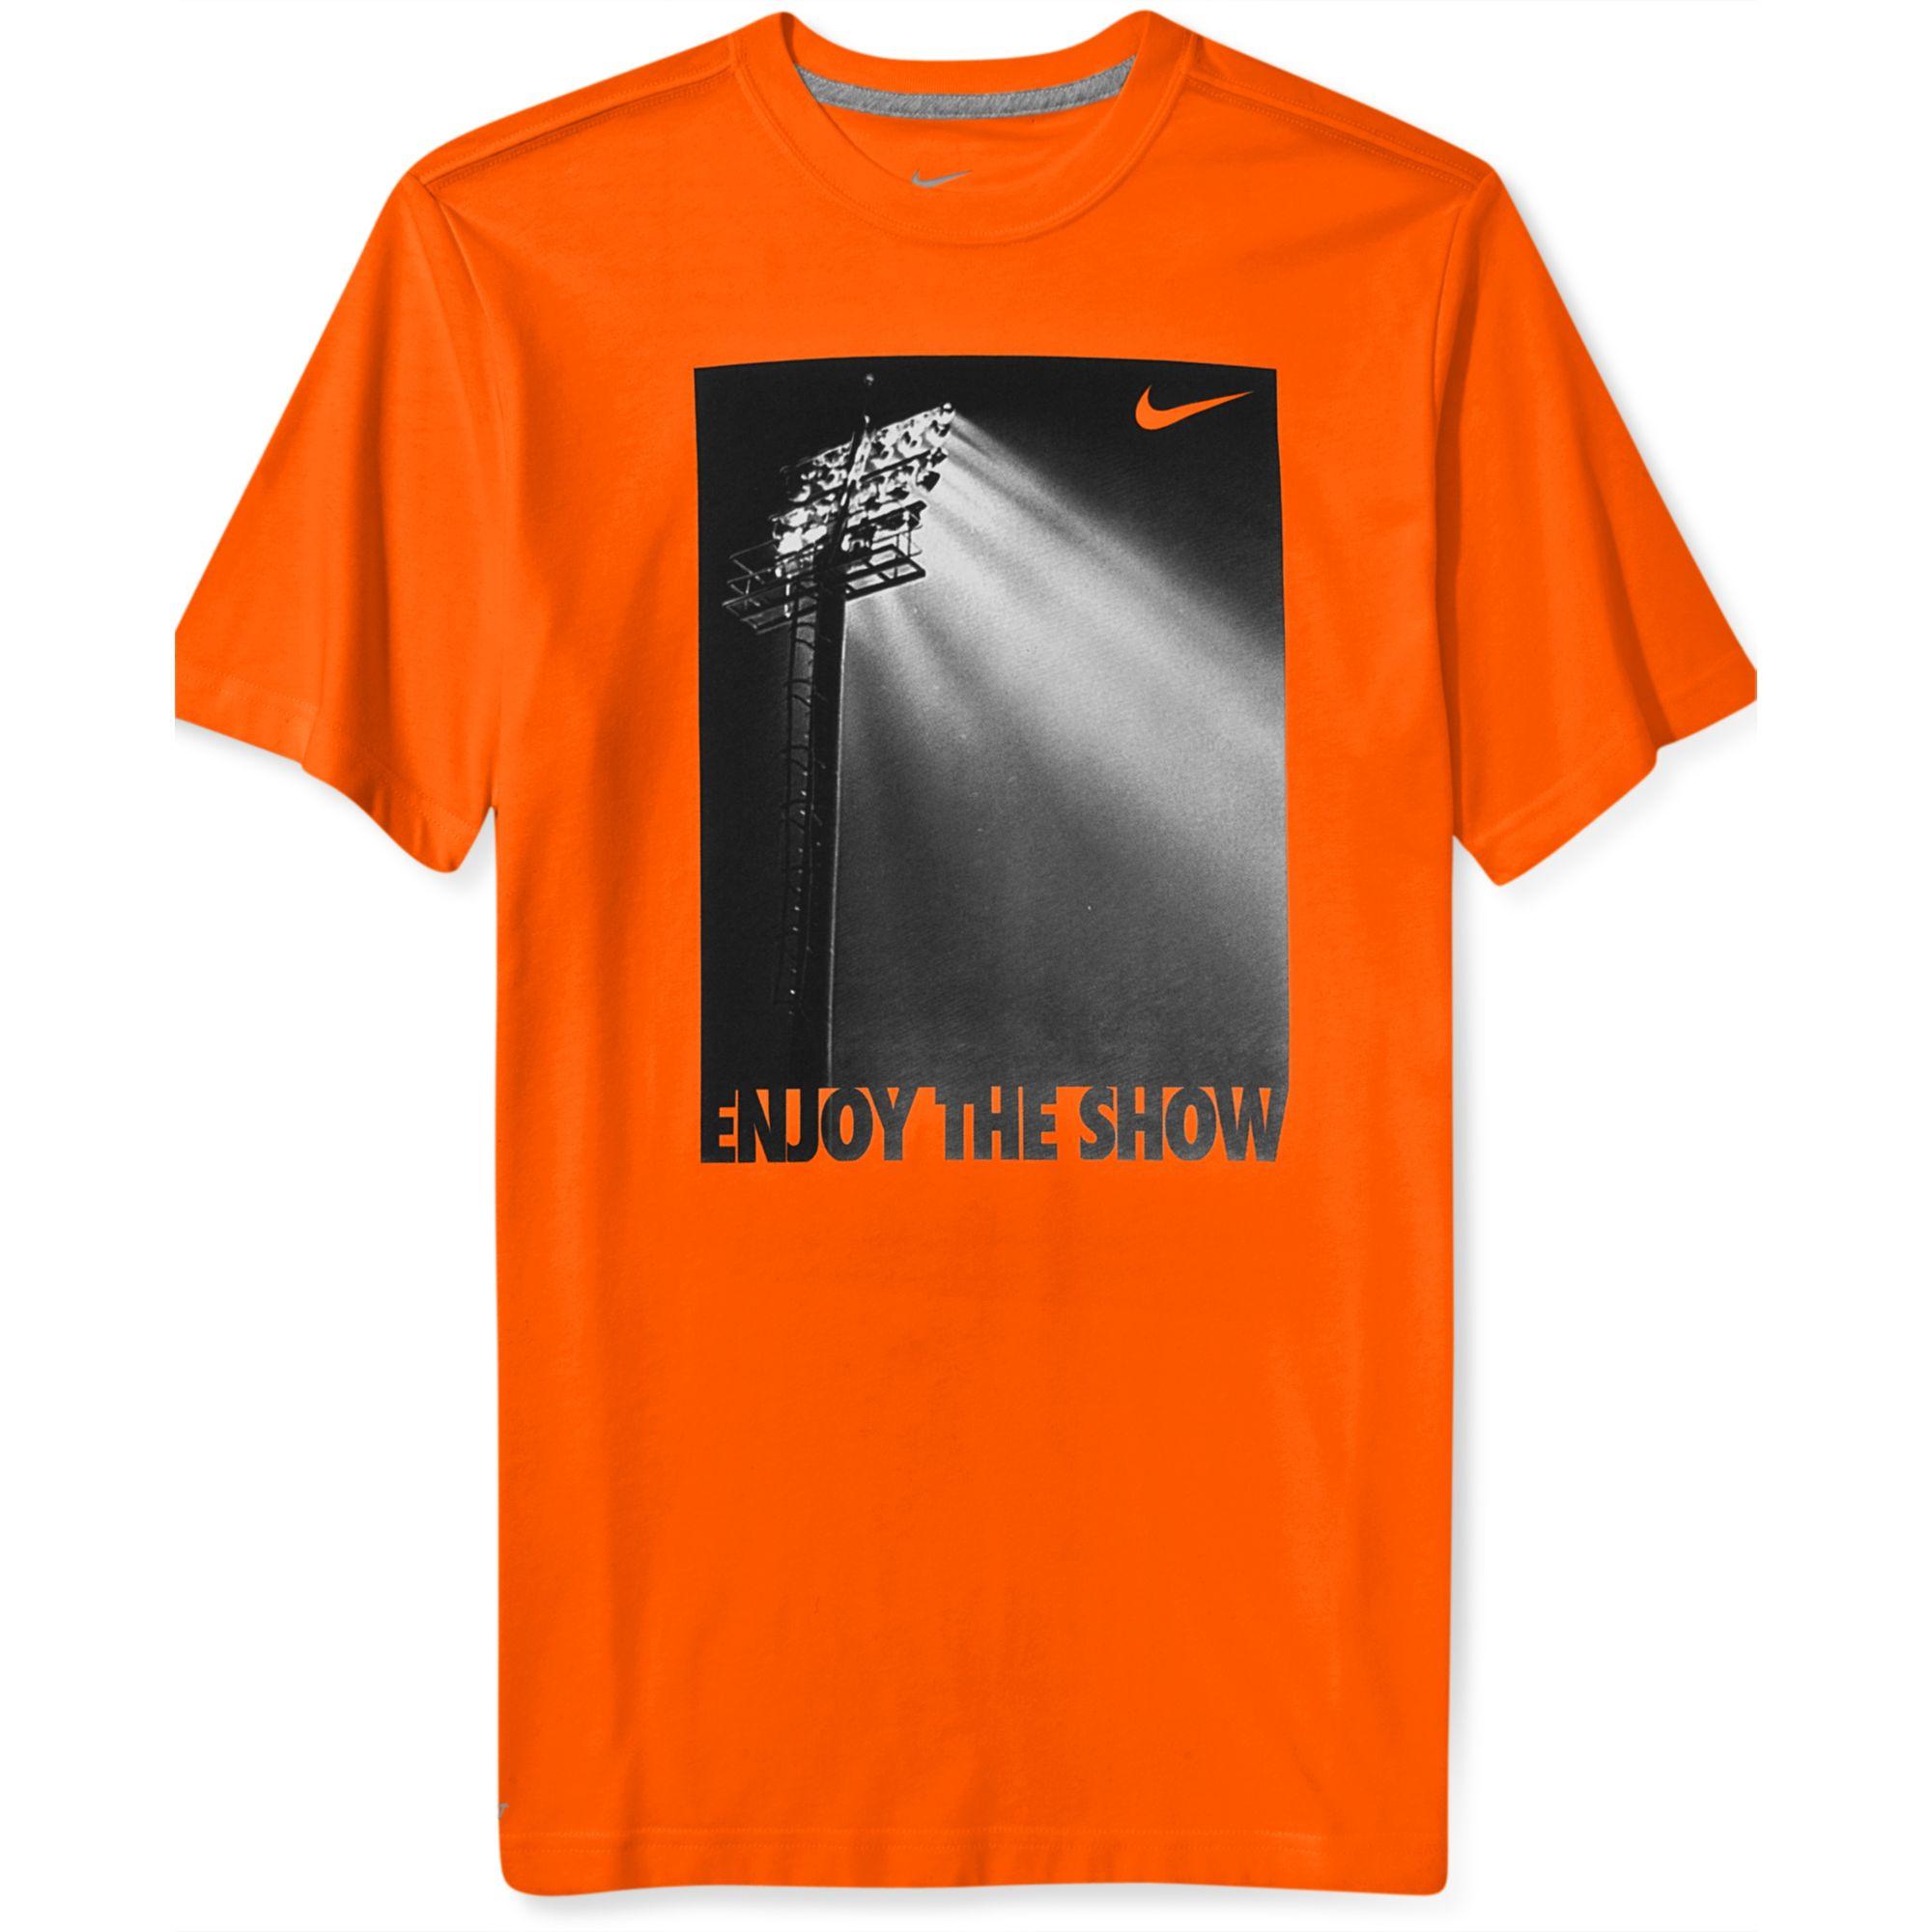 Nike Enjoy The Lights Graphic T-shirt in Orange for Men   Lyst